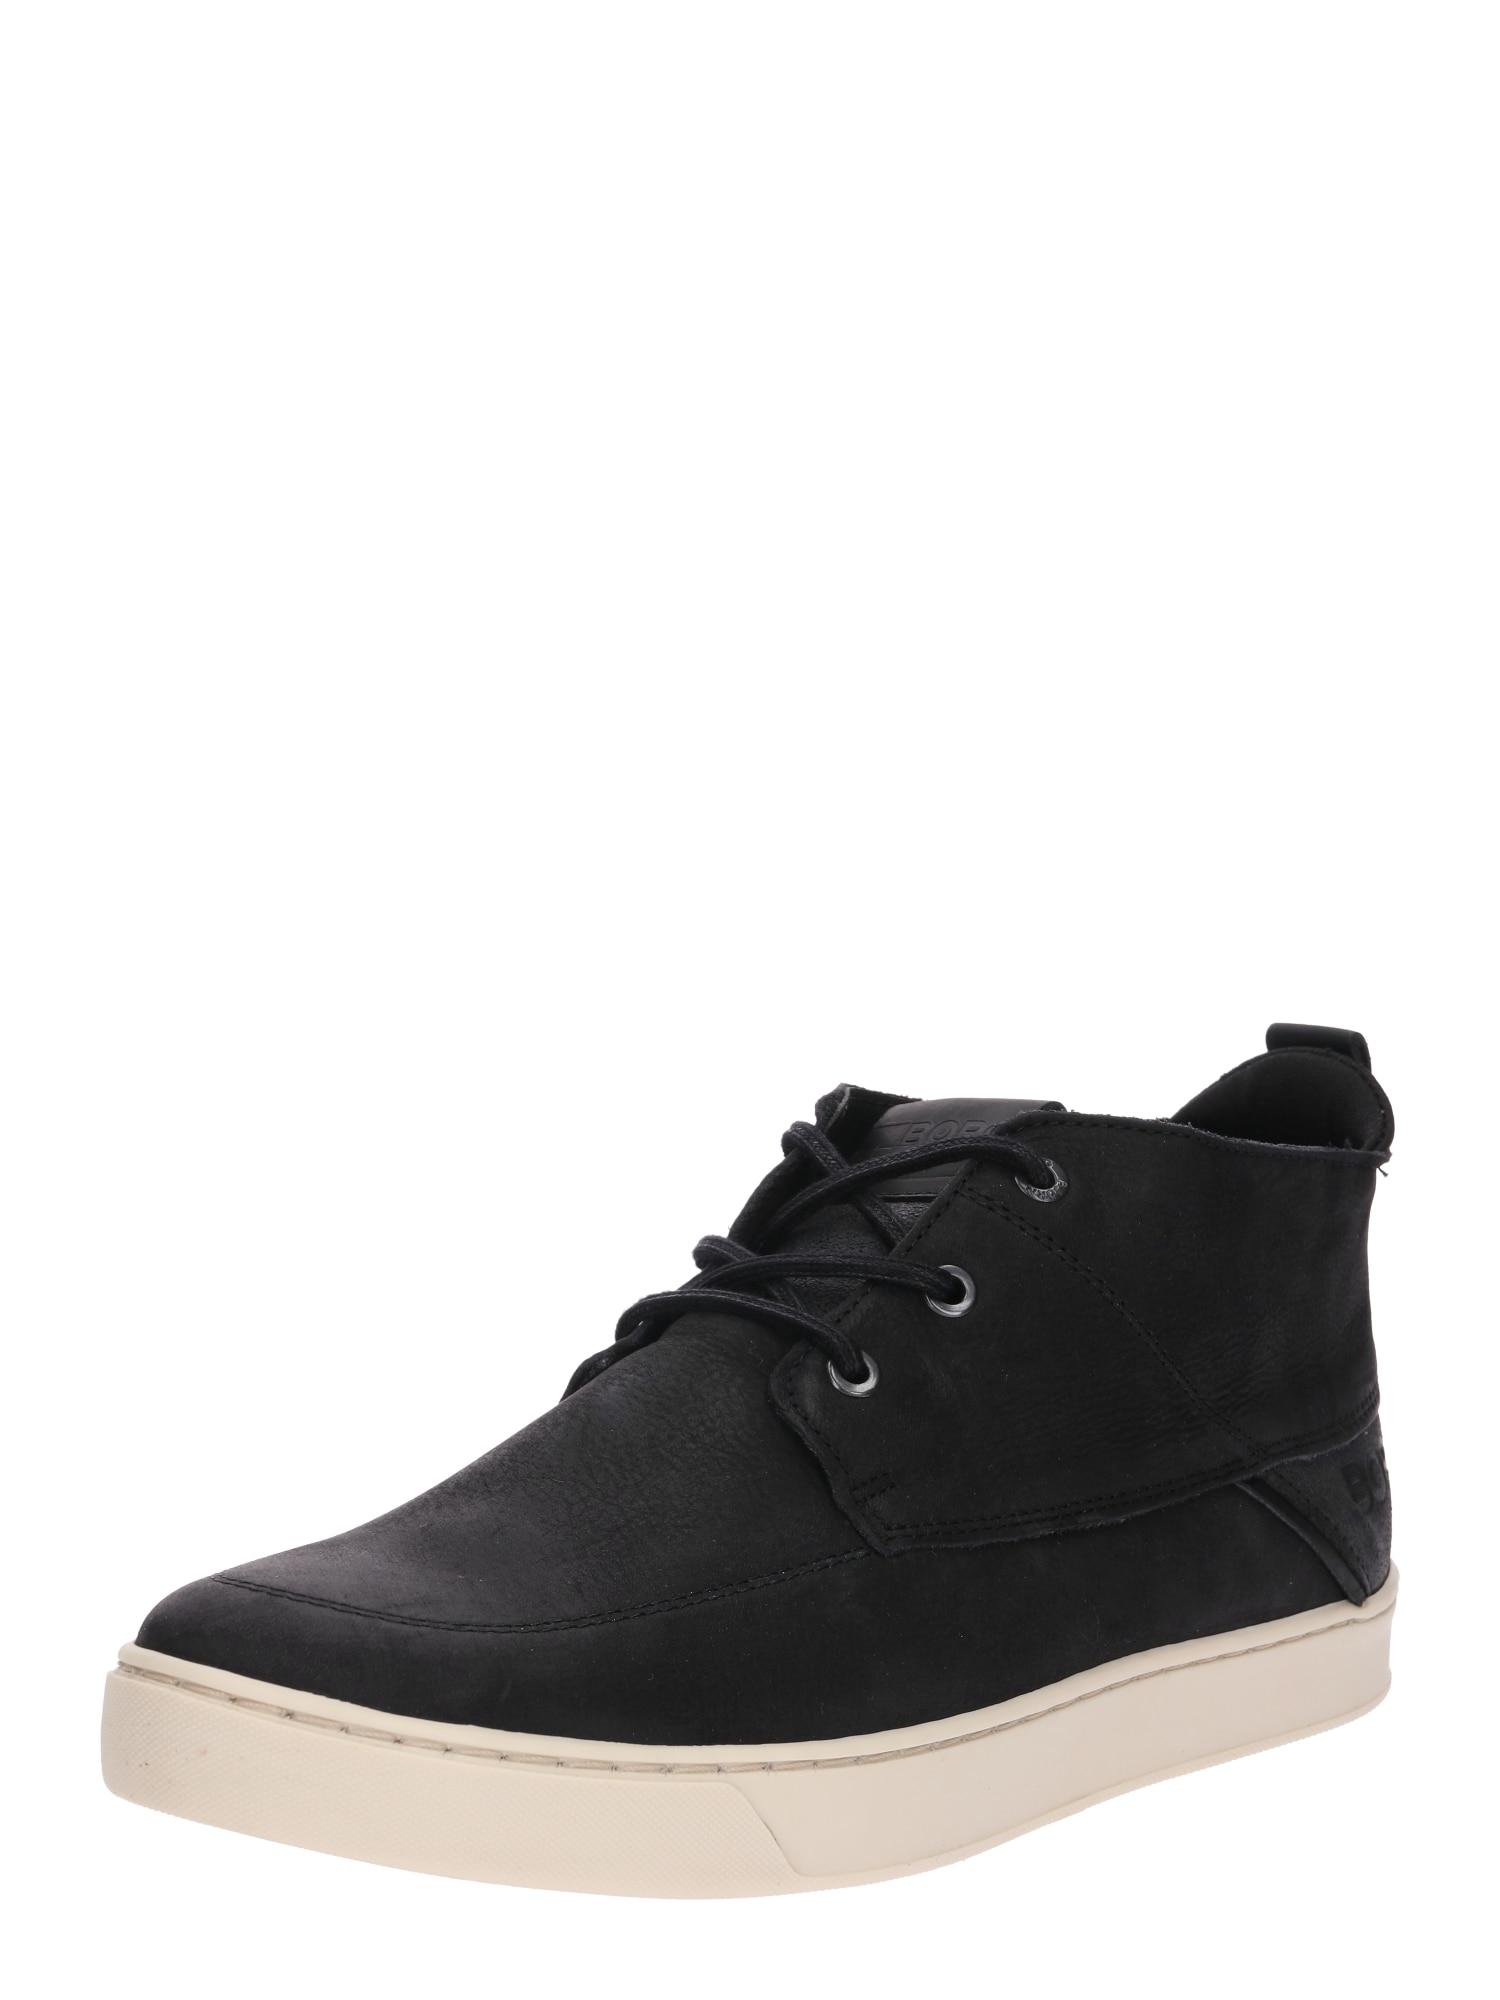 Šněrovací boty KARL  černá BJÖRN BORG